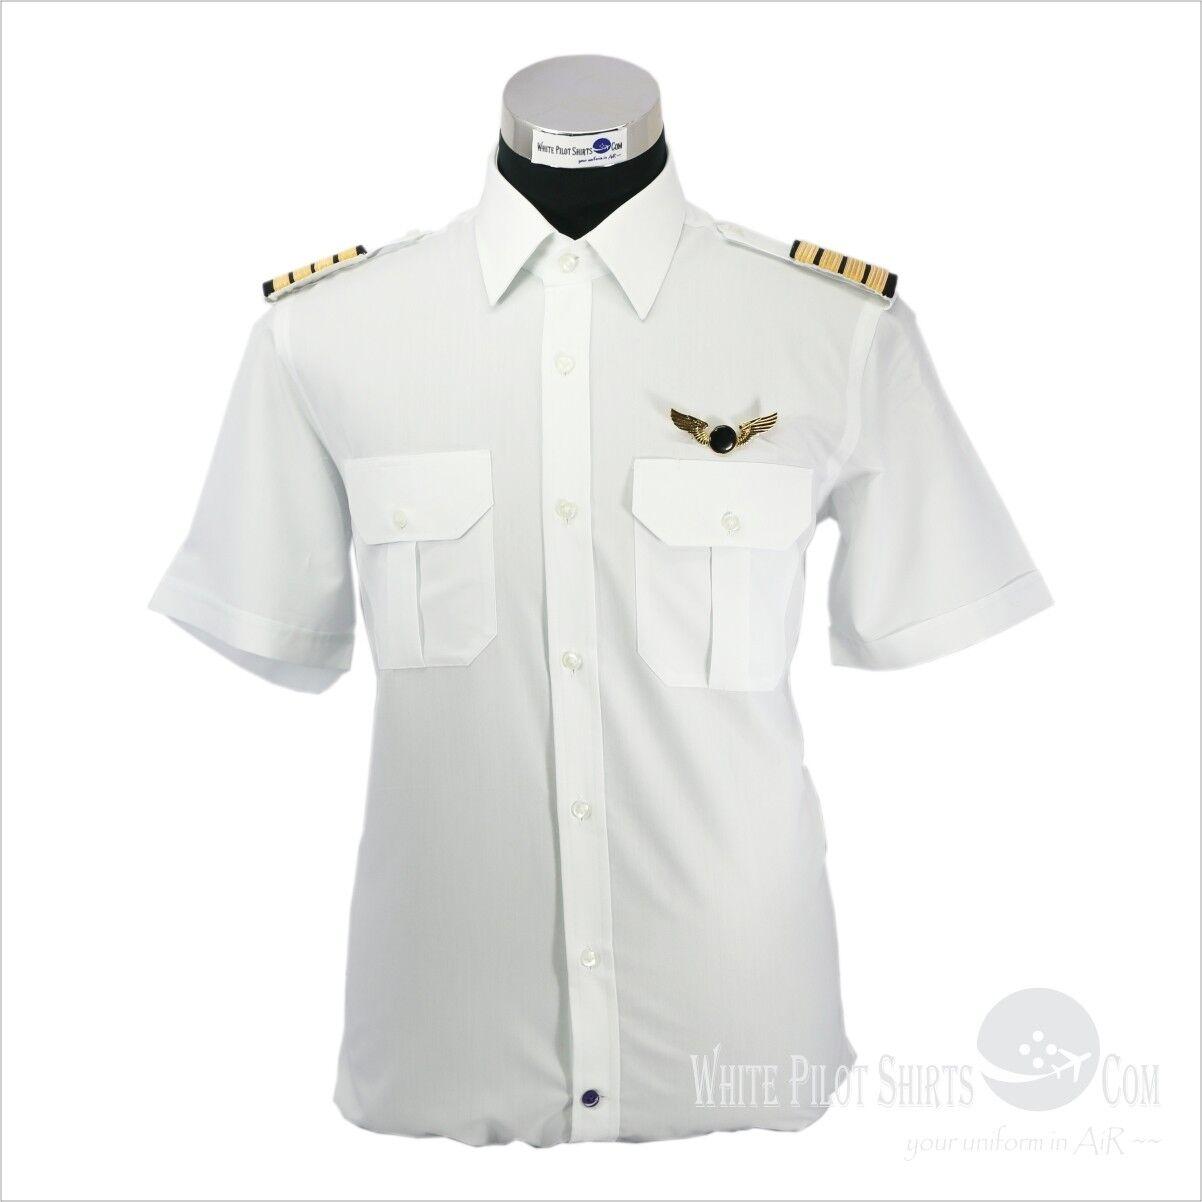 White Pilot Shirts Aviator Uniforms Easy to iron Airmen Security Aviation Mens